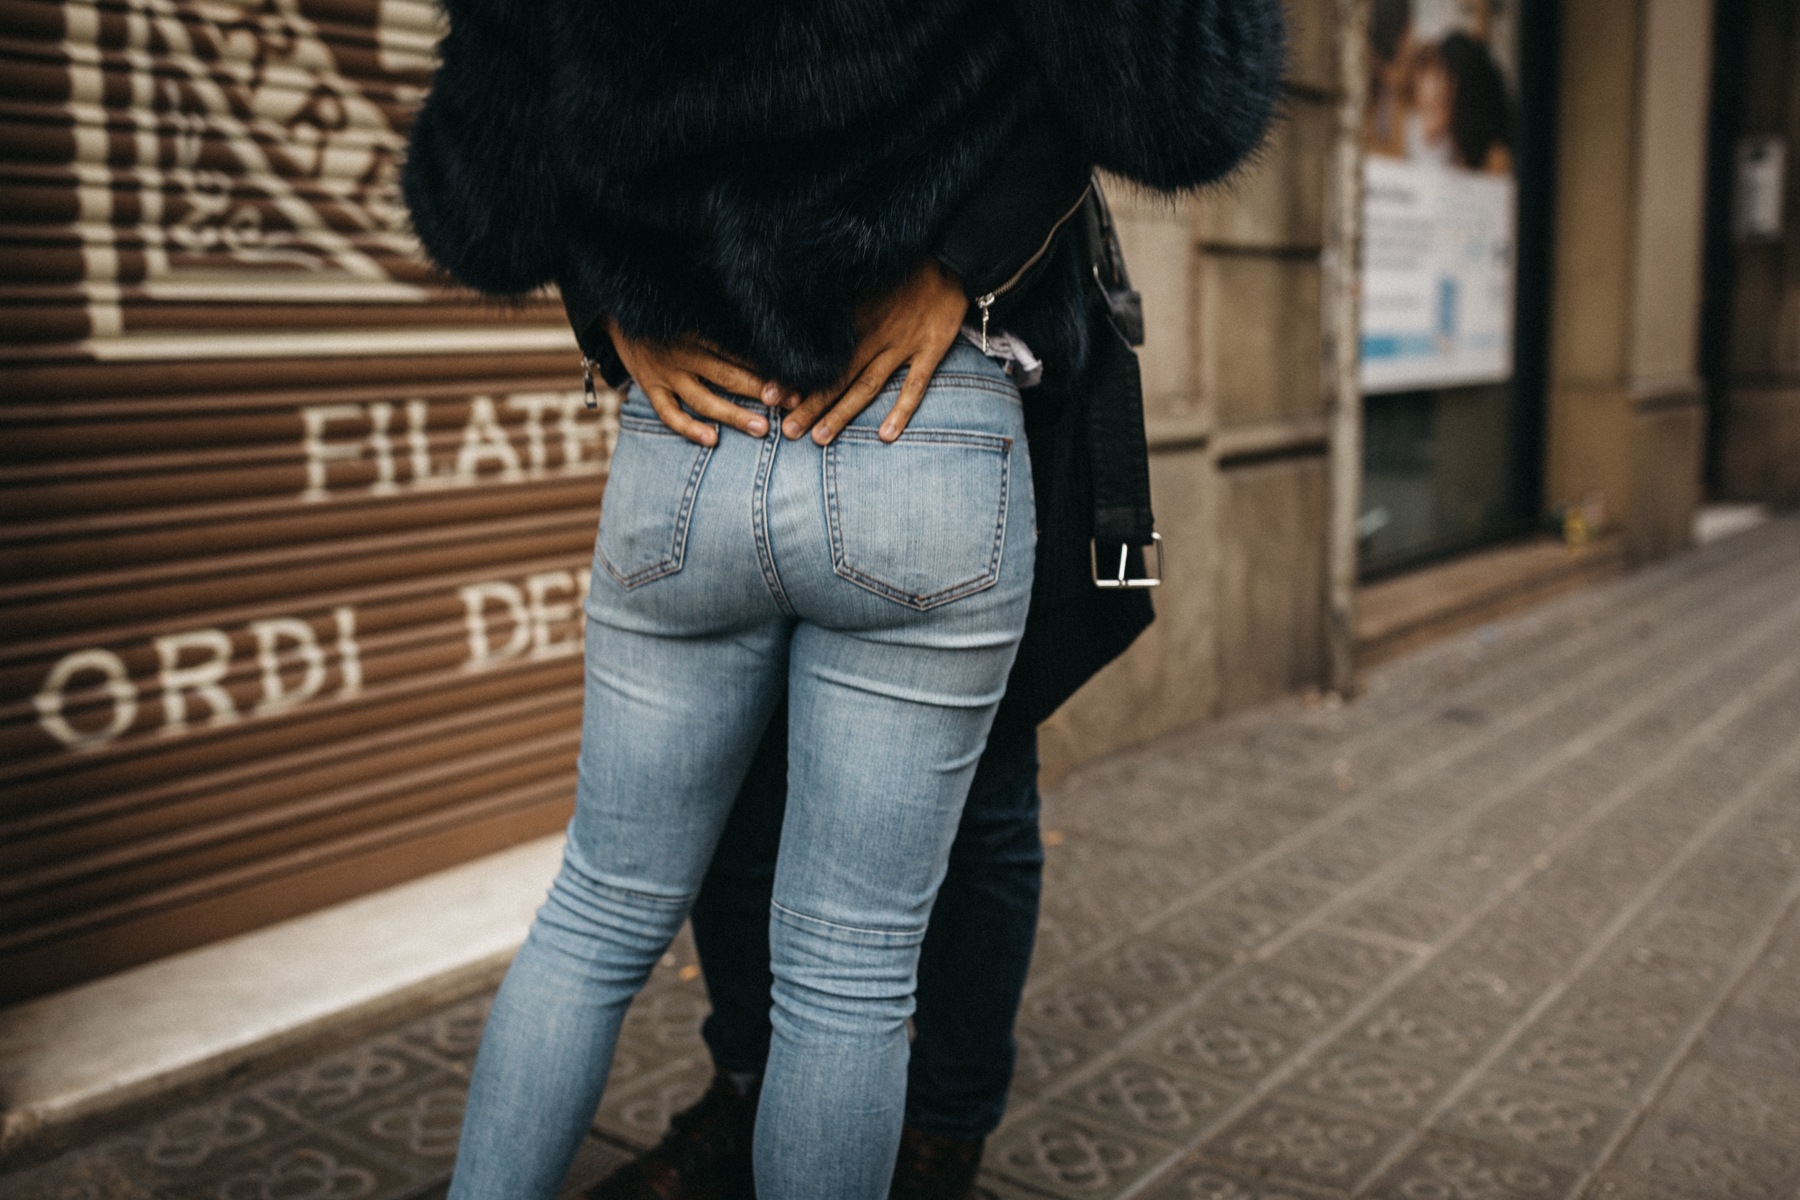 raissa simon fotografie urban coupleshooting barcelona 014 - Wietske + Stefanos